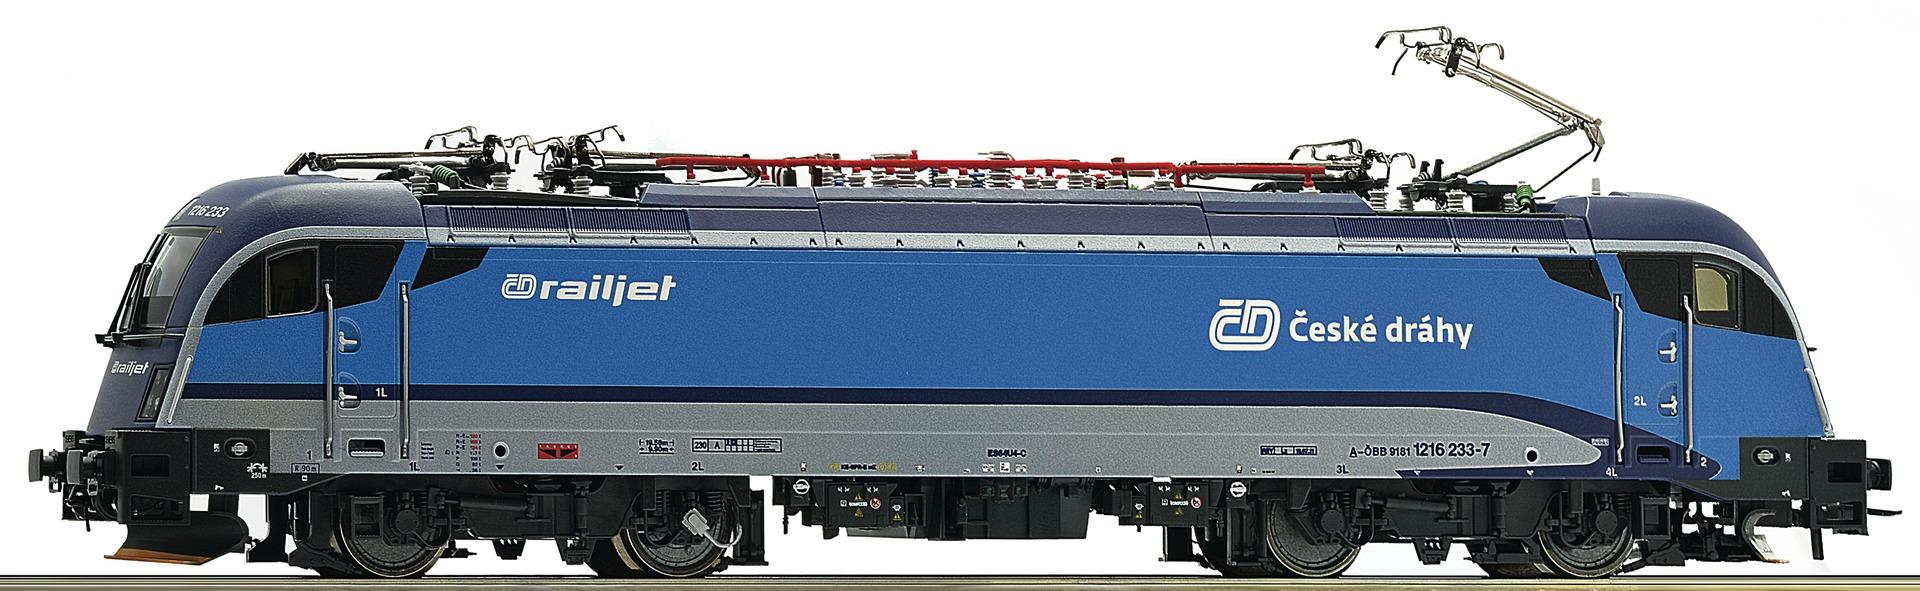 ROCO model train digital sound Rh 1216 Railjet der CD electric locomotive # 73499<br><br>Aliexpress